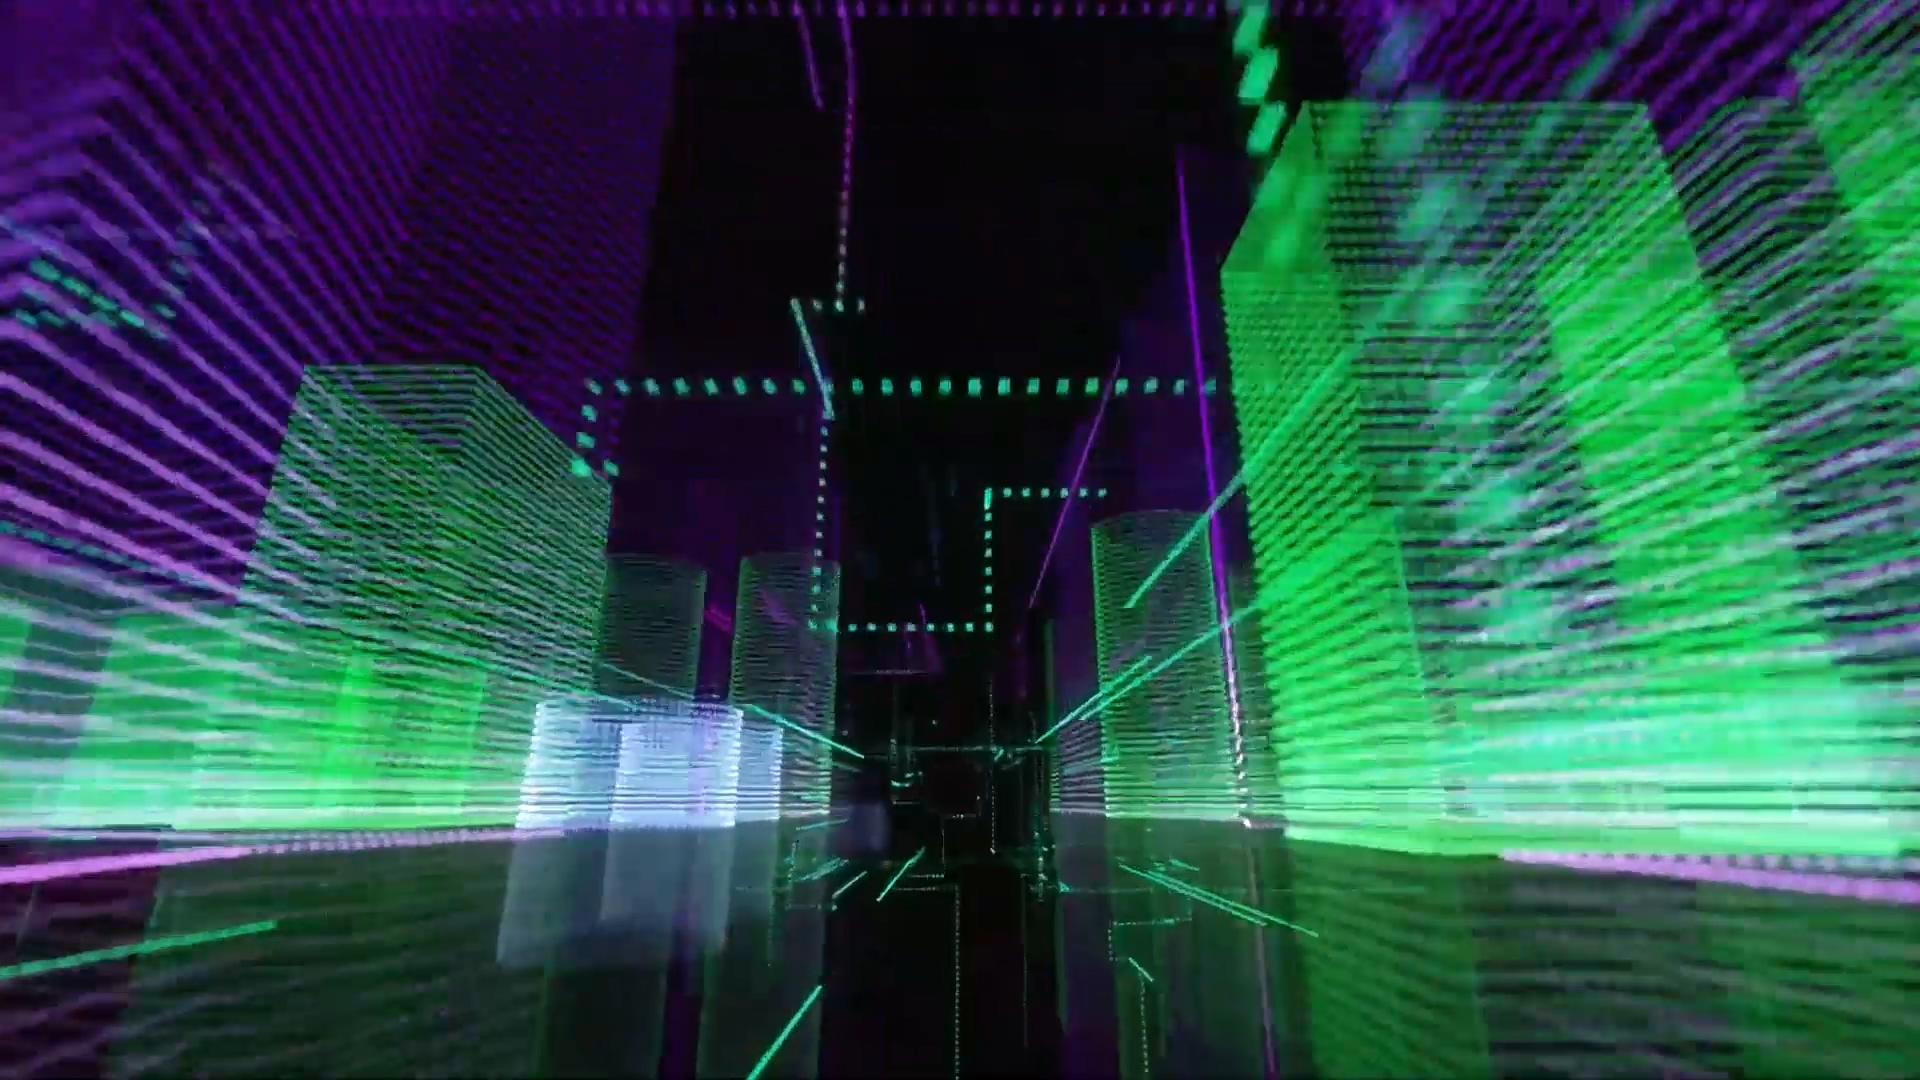 Fadedj舞台背景led夜店vj流行科技感穿梭高清视频素材